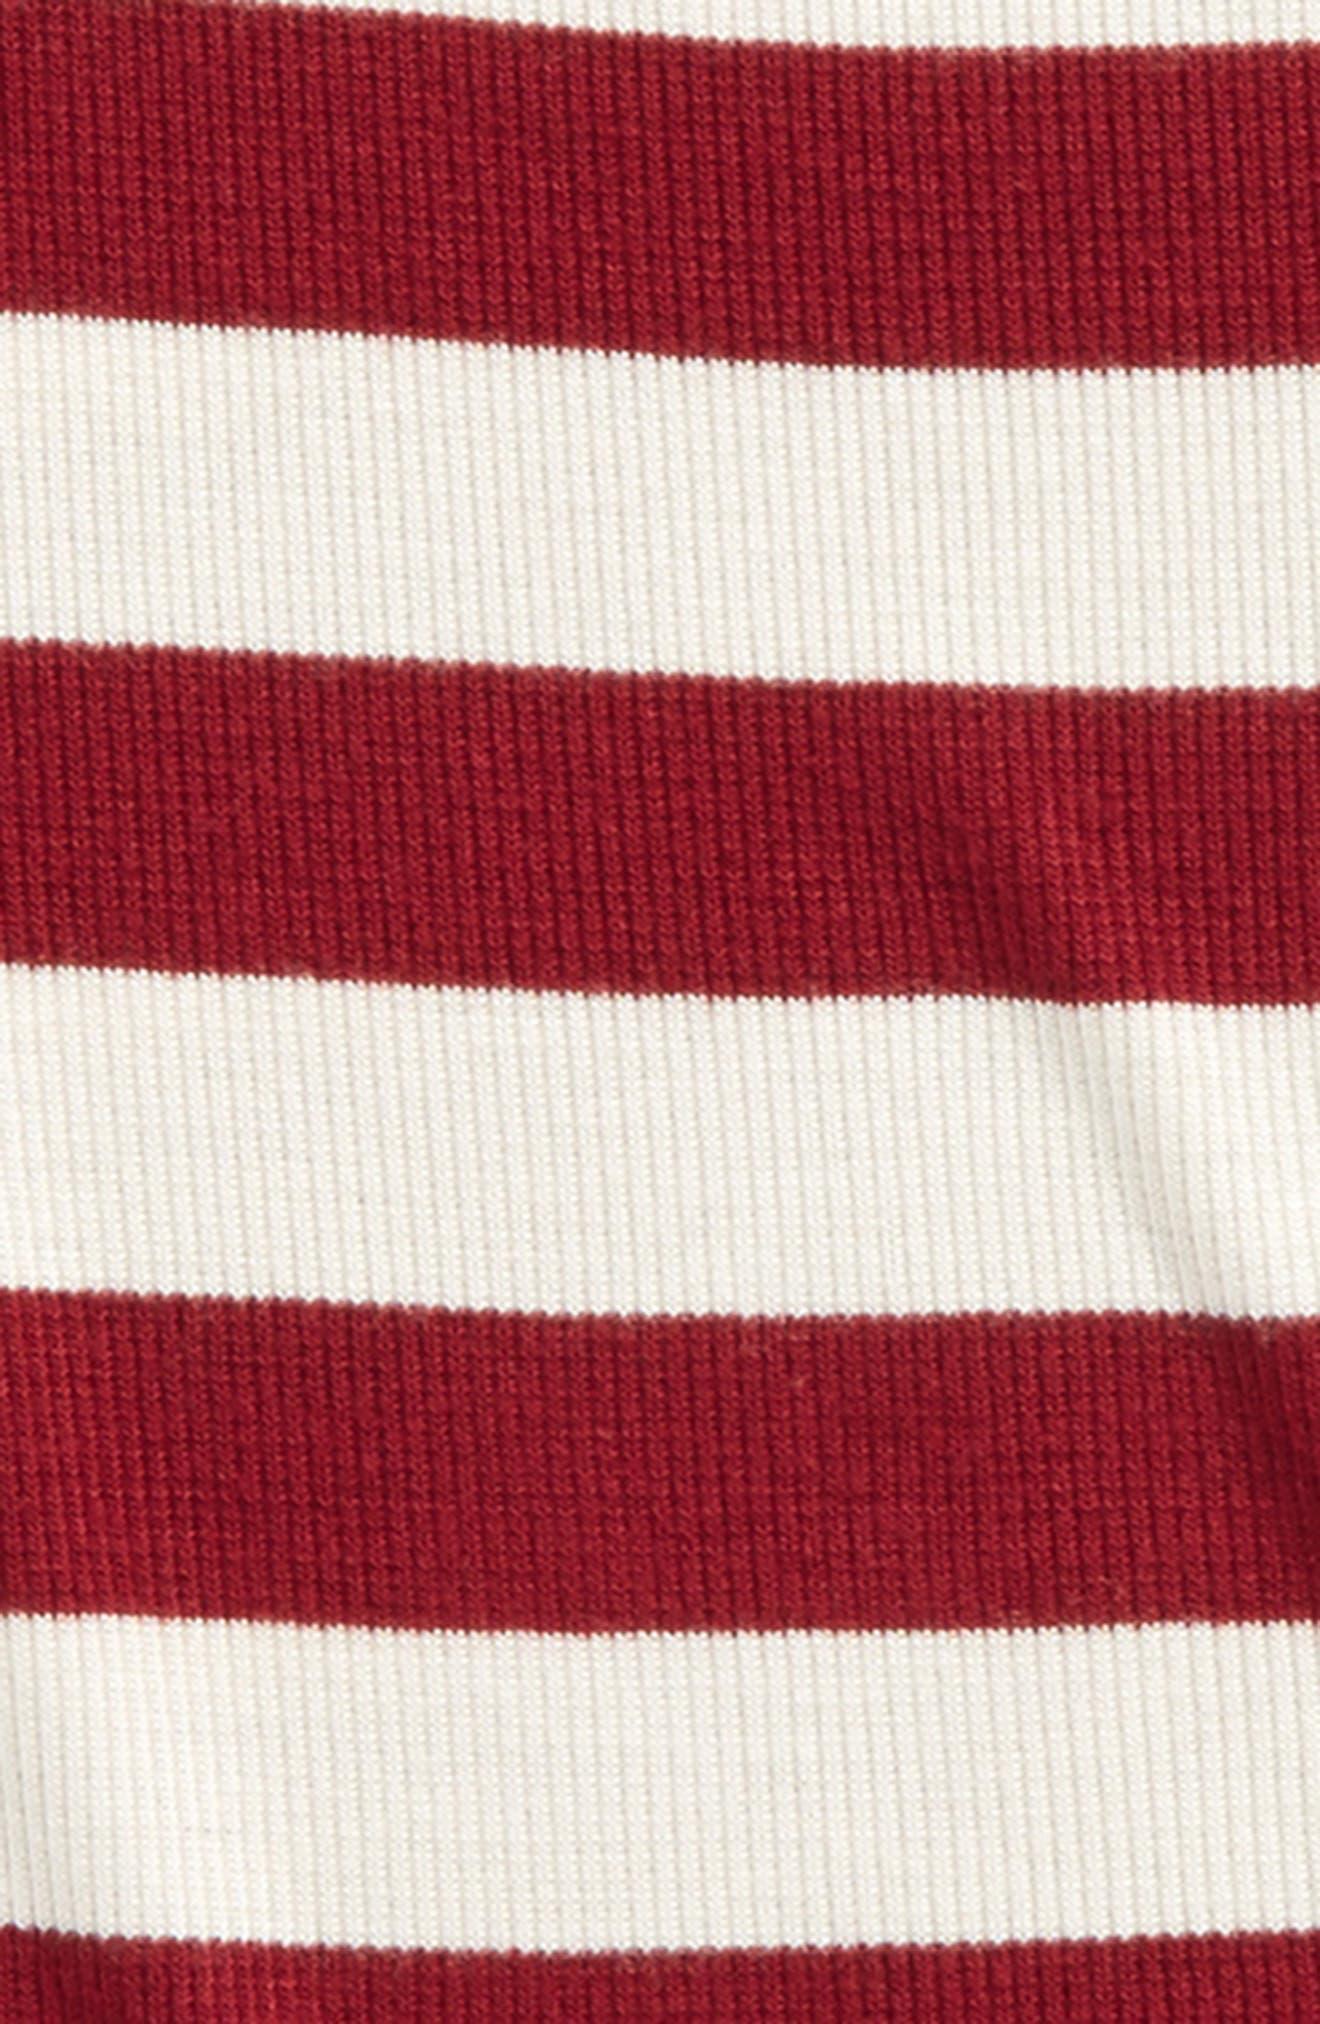 Swing Tank,                             Alternate thumbnail 2, color,                             Red Samba- Ivory Stripe